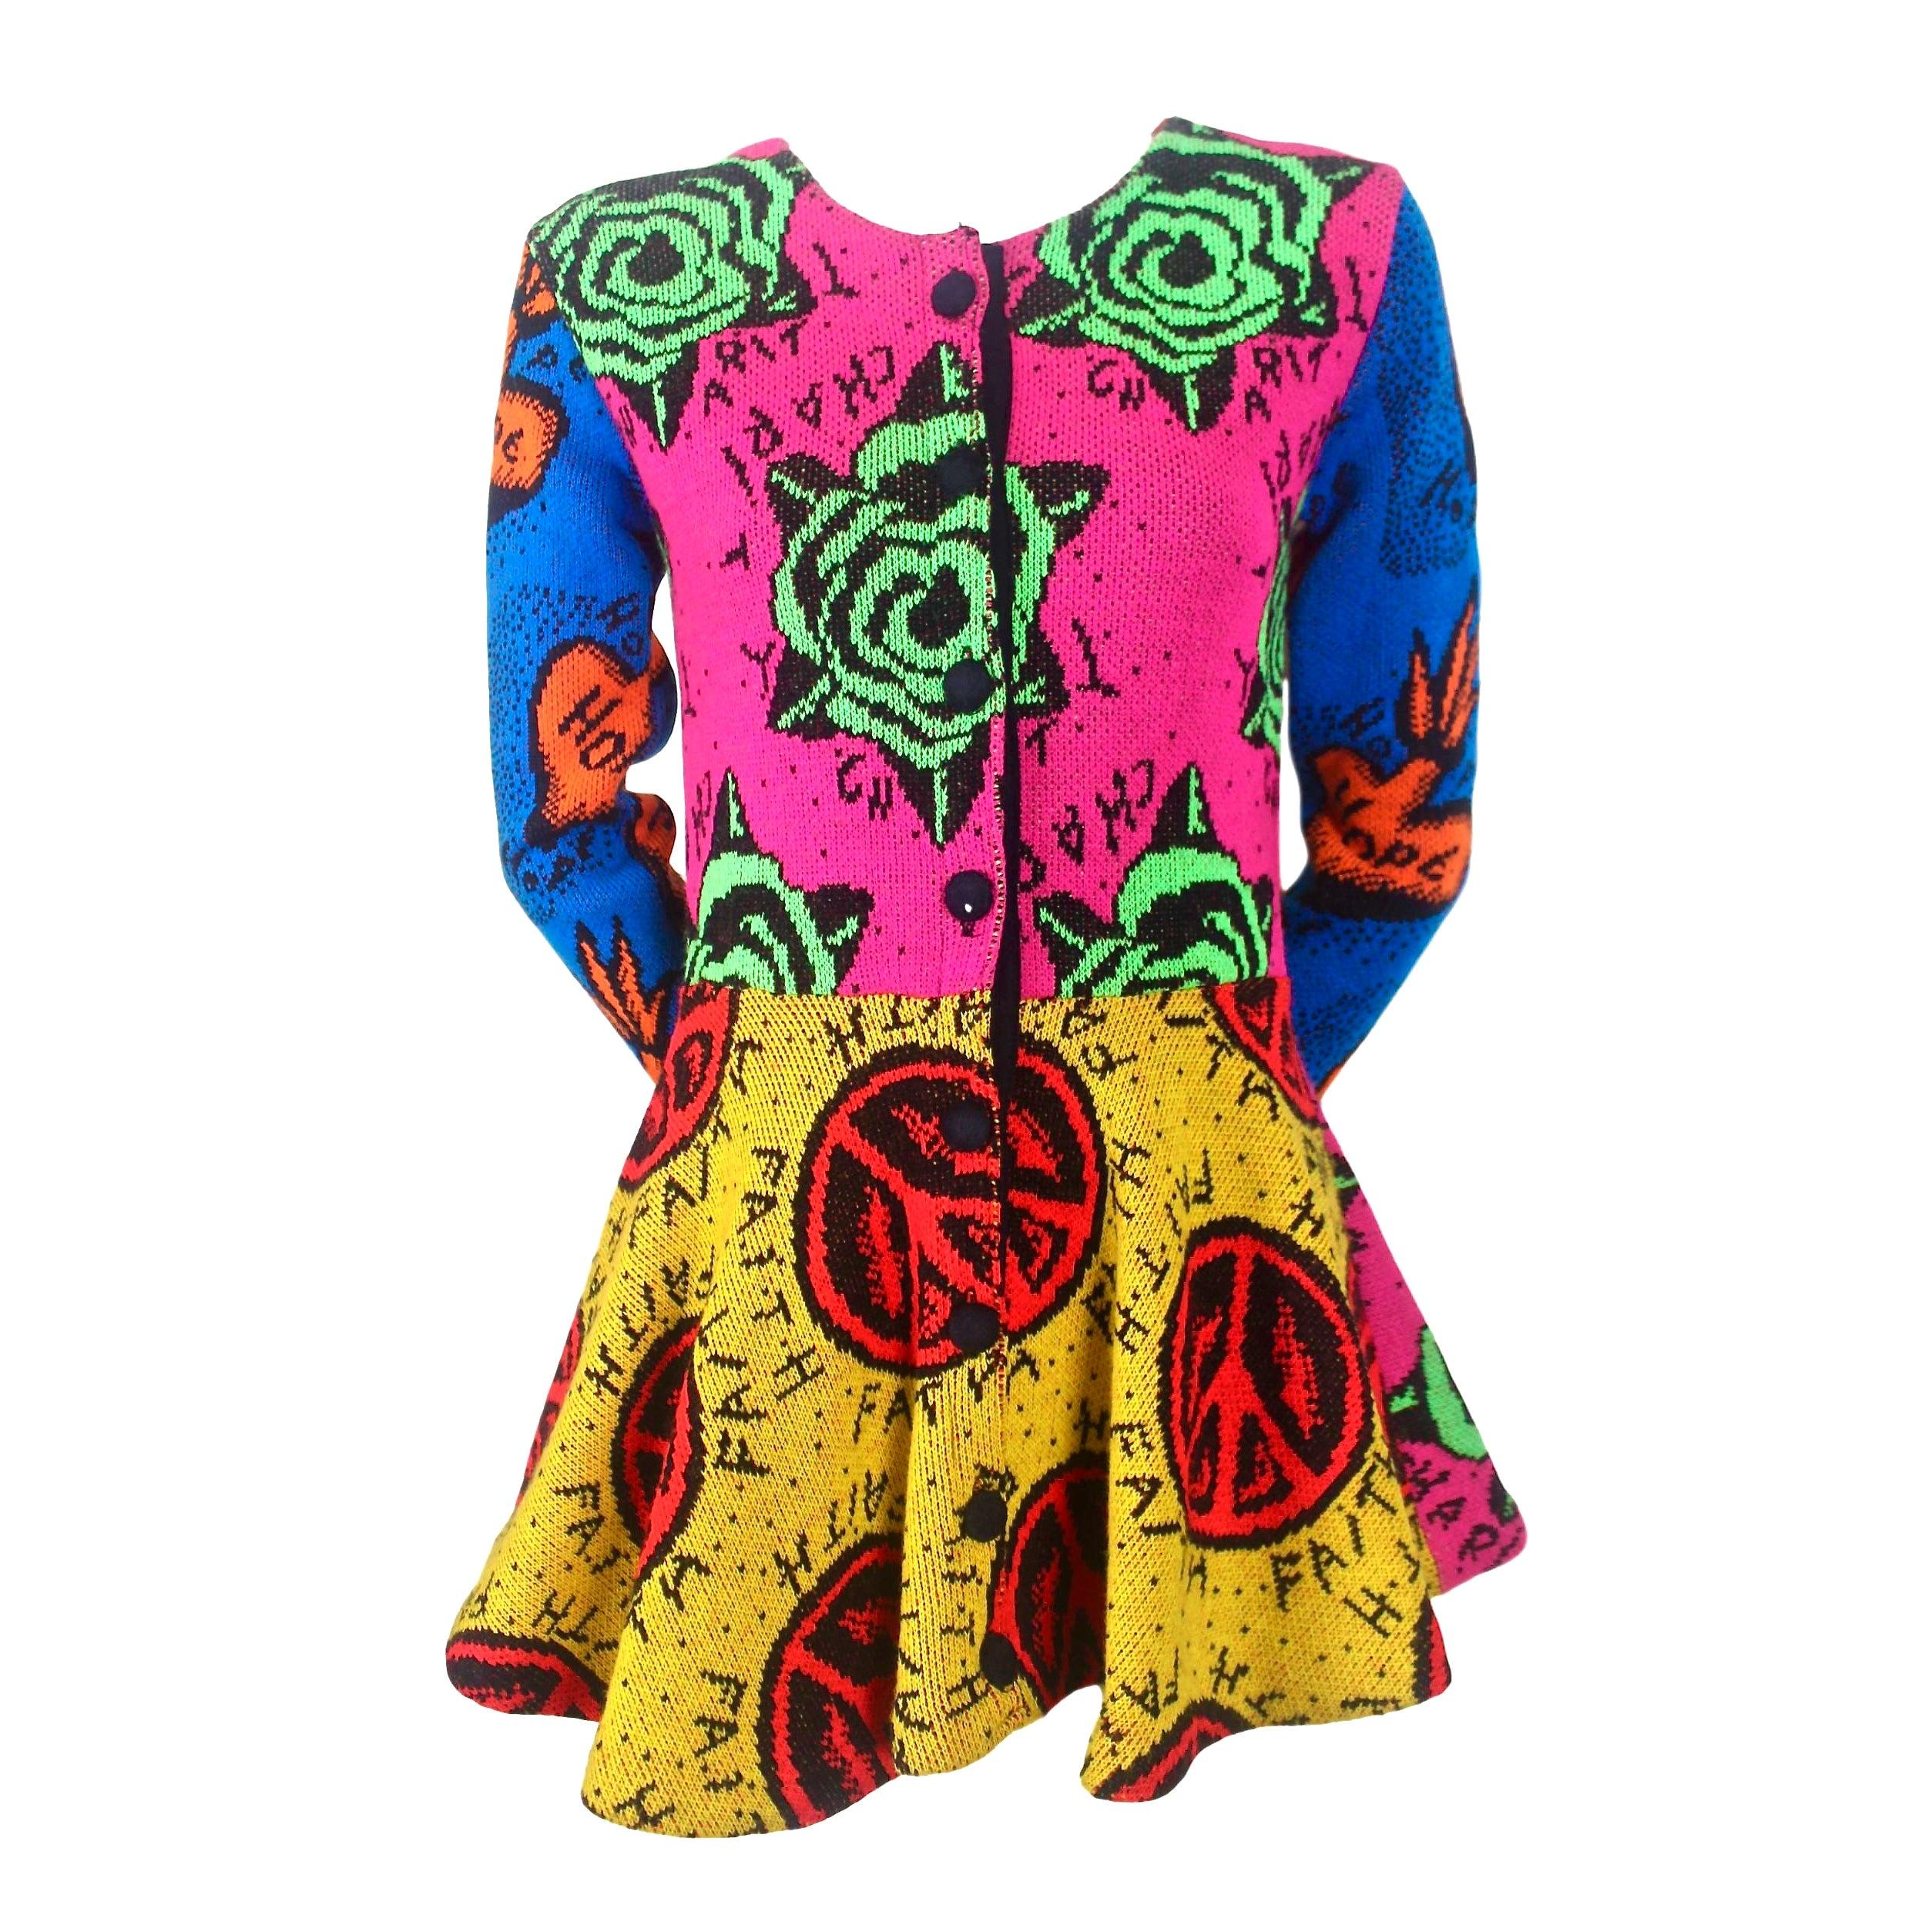 Original Betsey Johnson Colourful Peplum Knit Jacket Faith, Hope and Charity